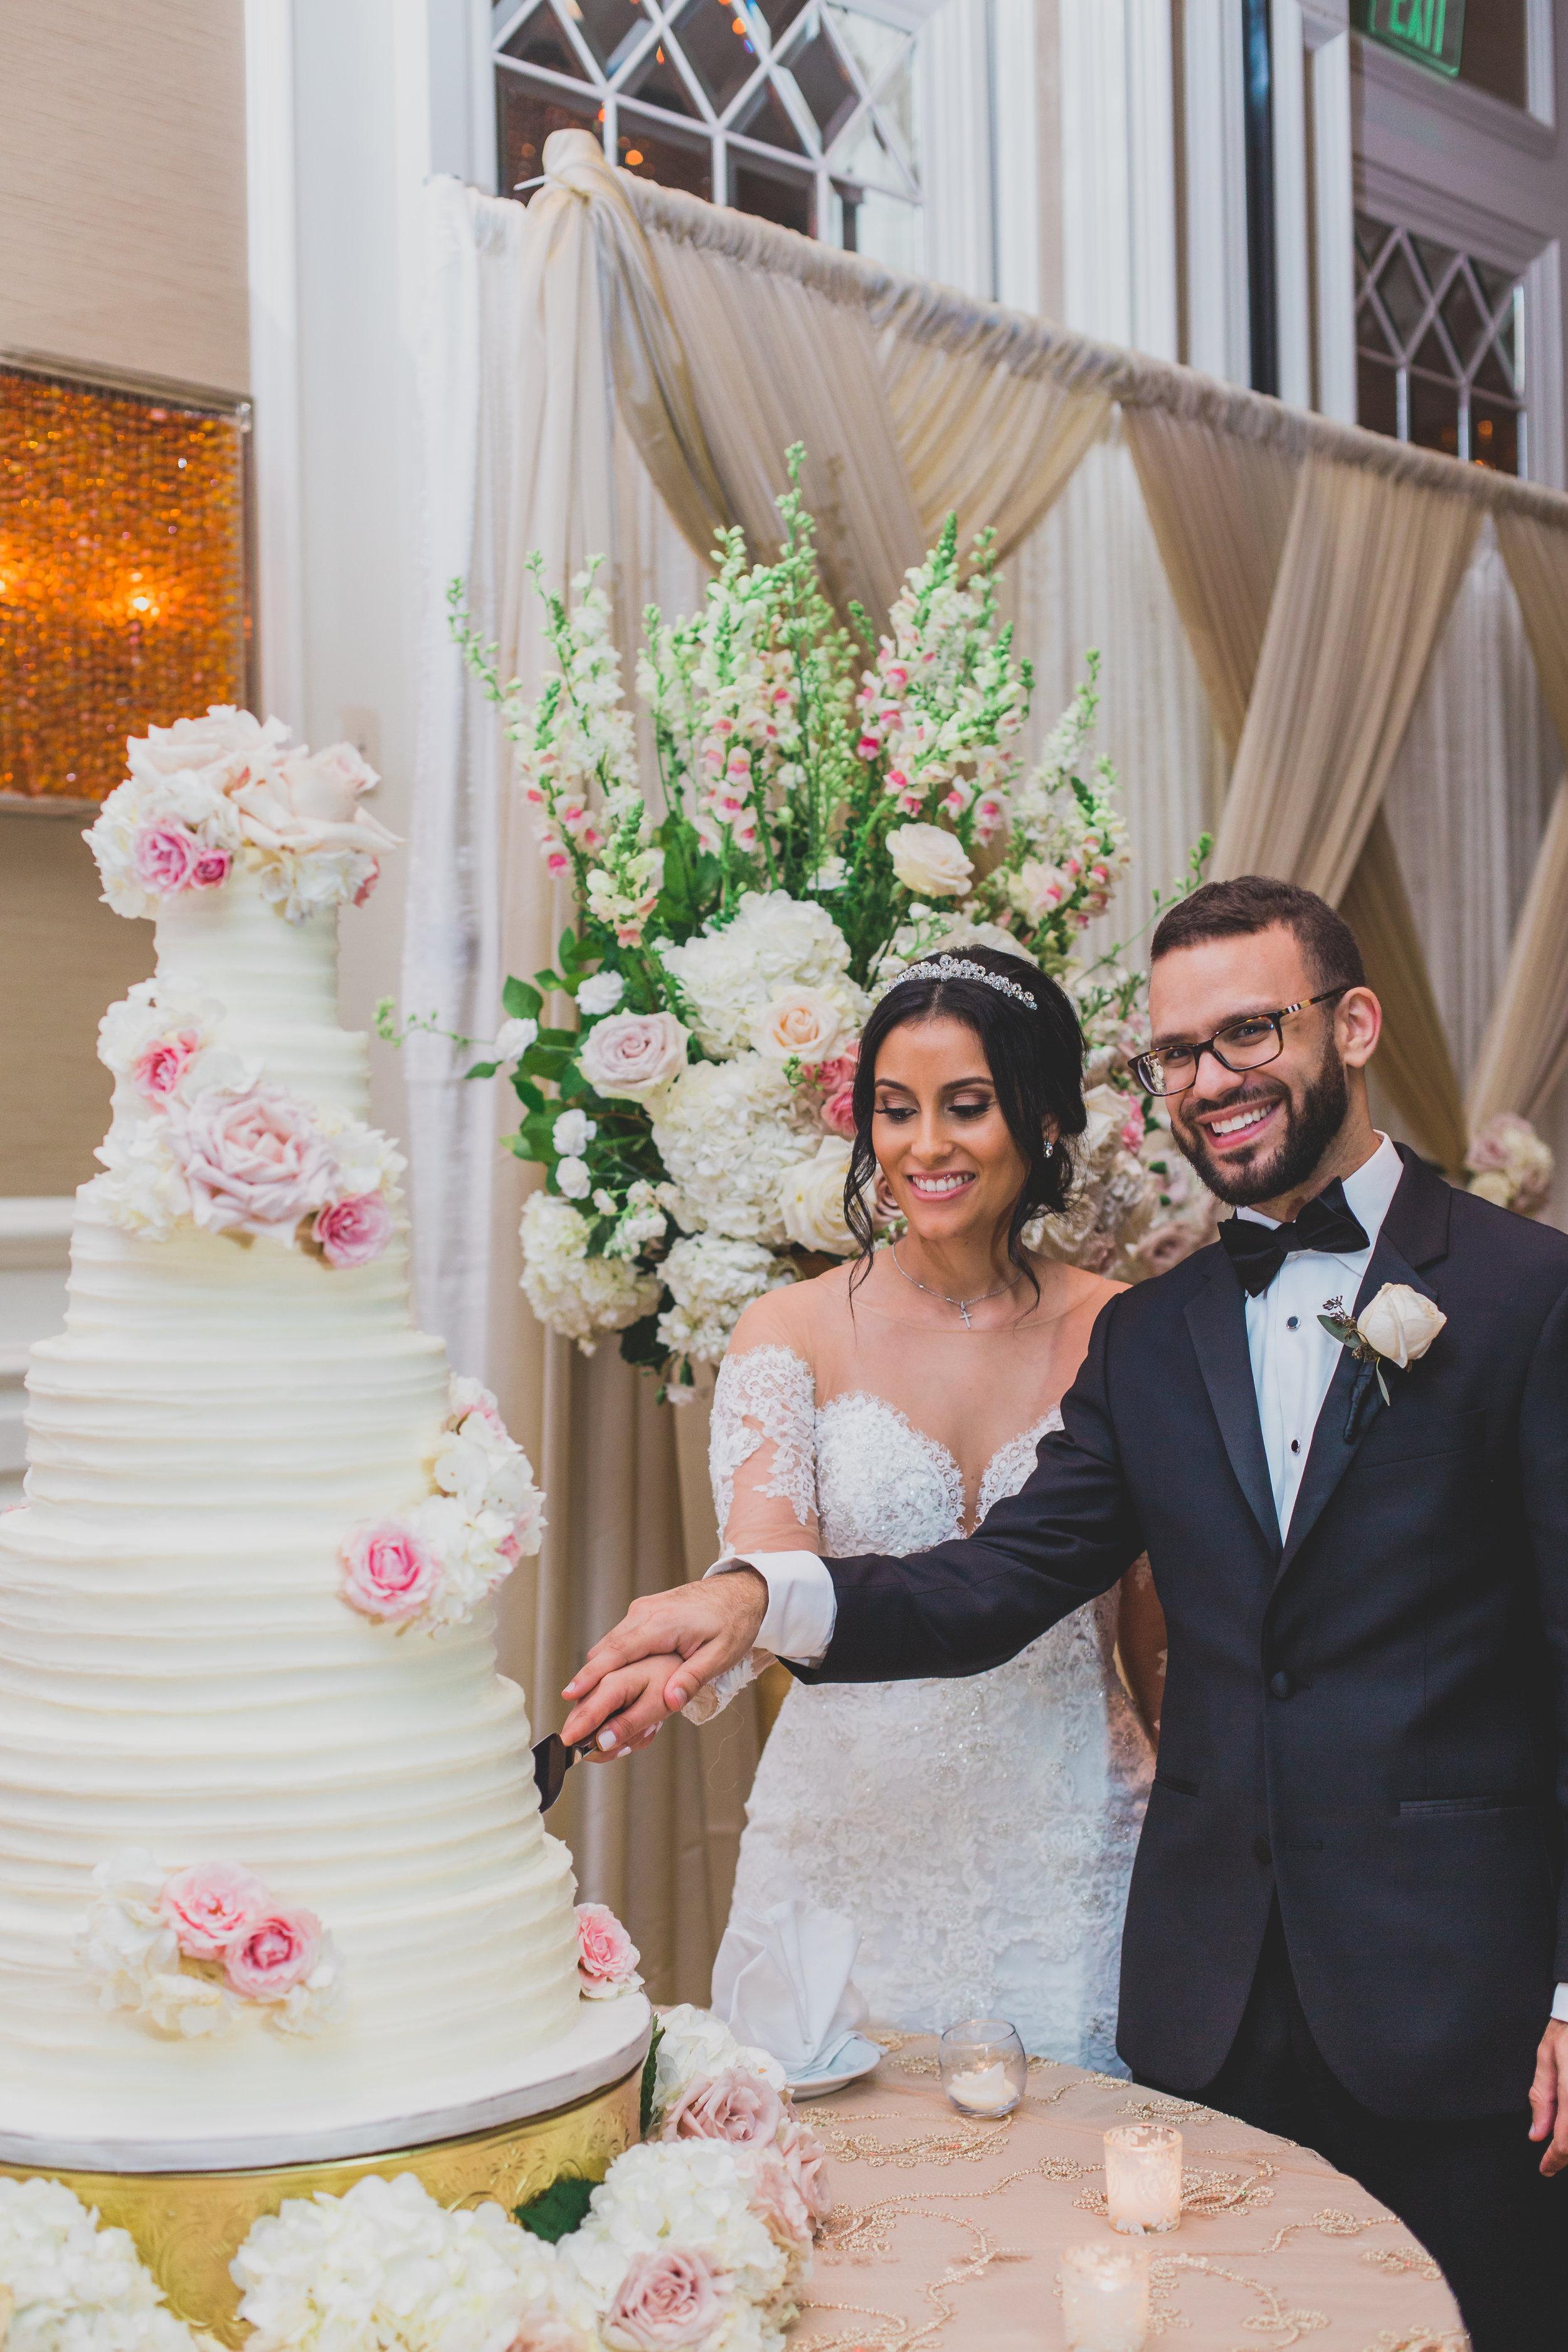 sugar-land-tx-wedding-photography-marriott-cake-cutting-ceremony